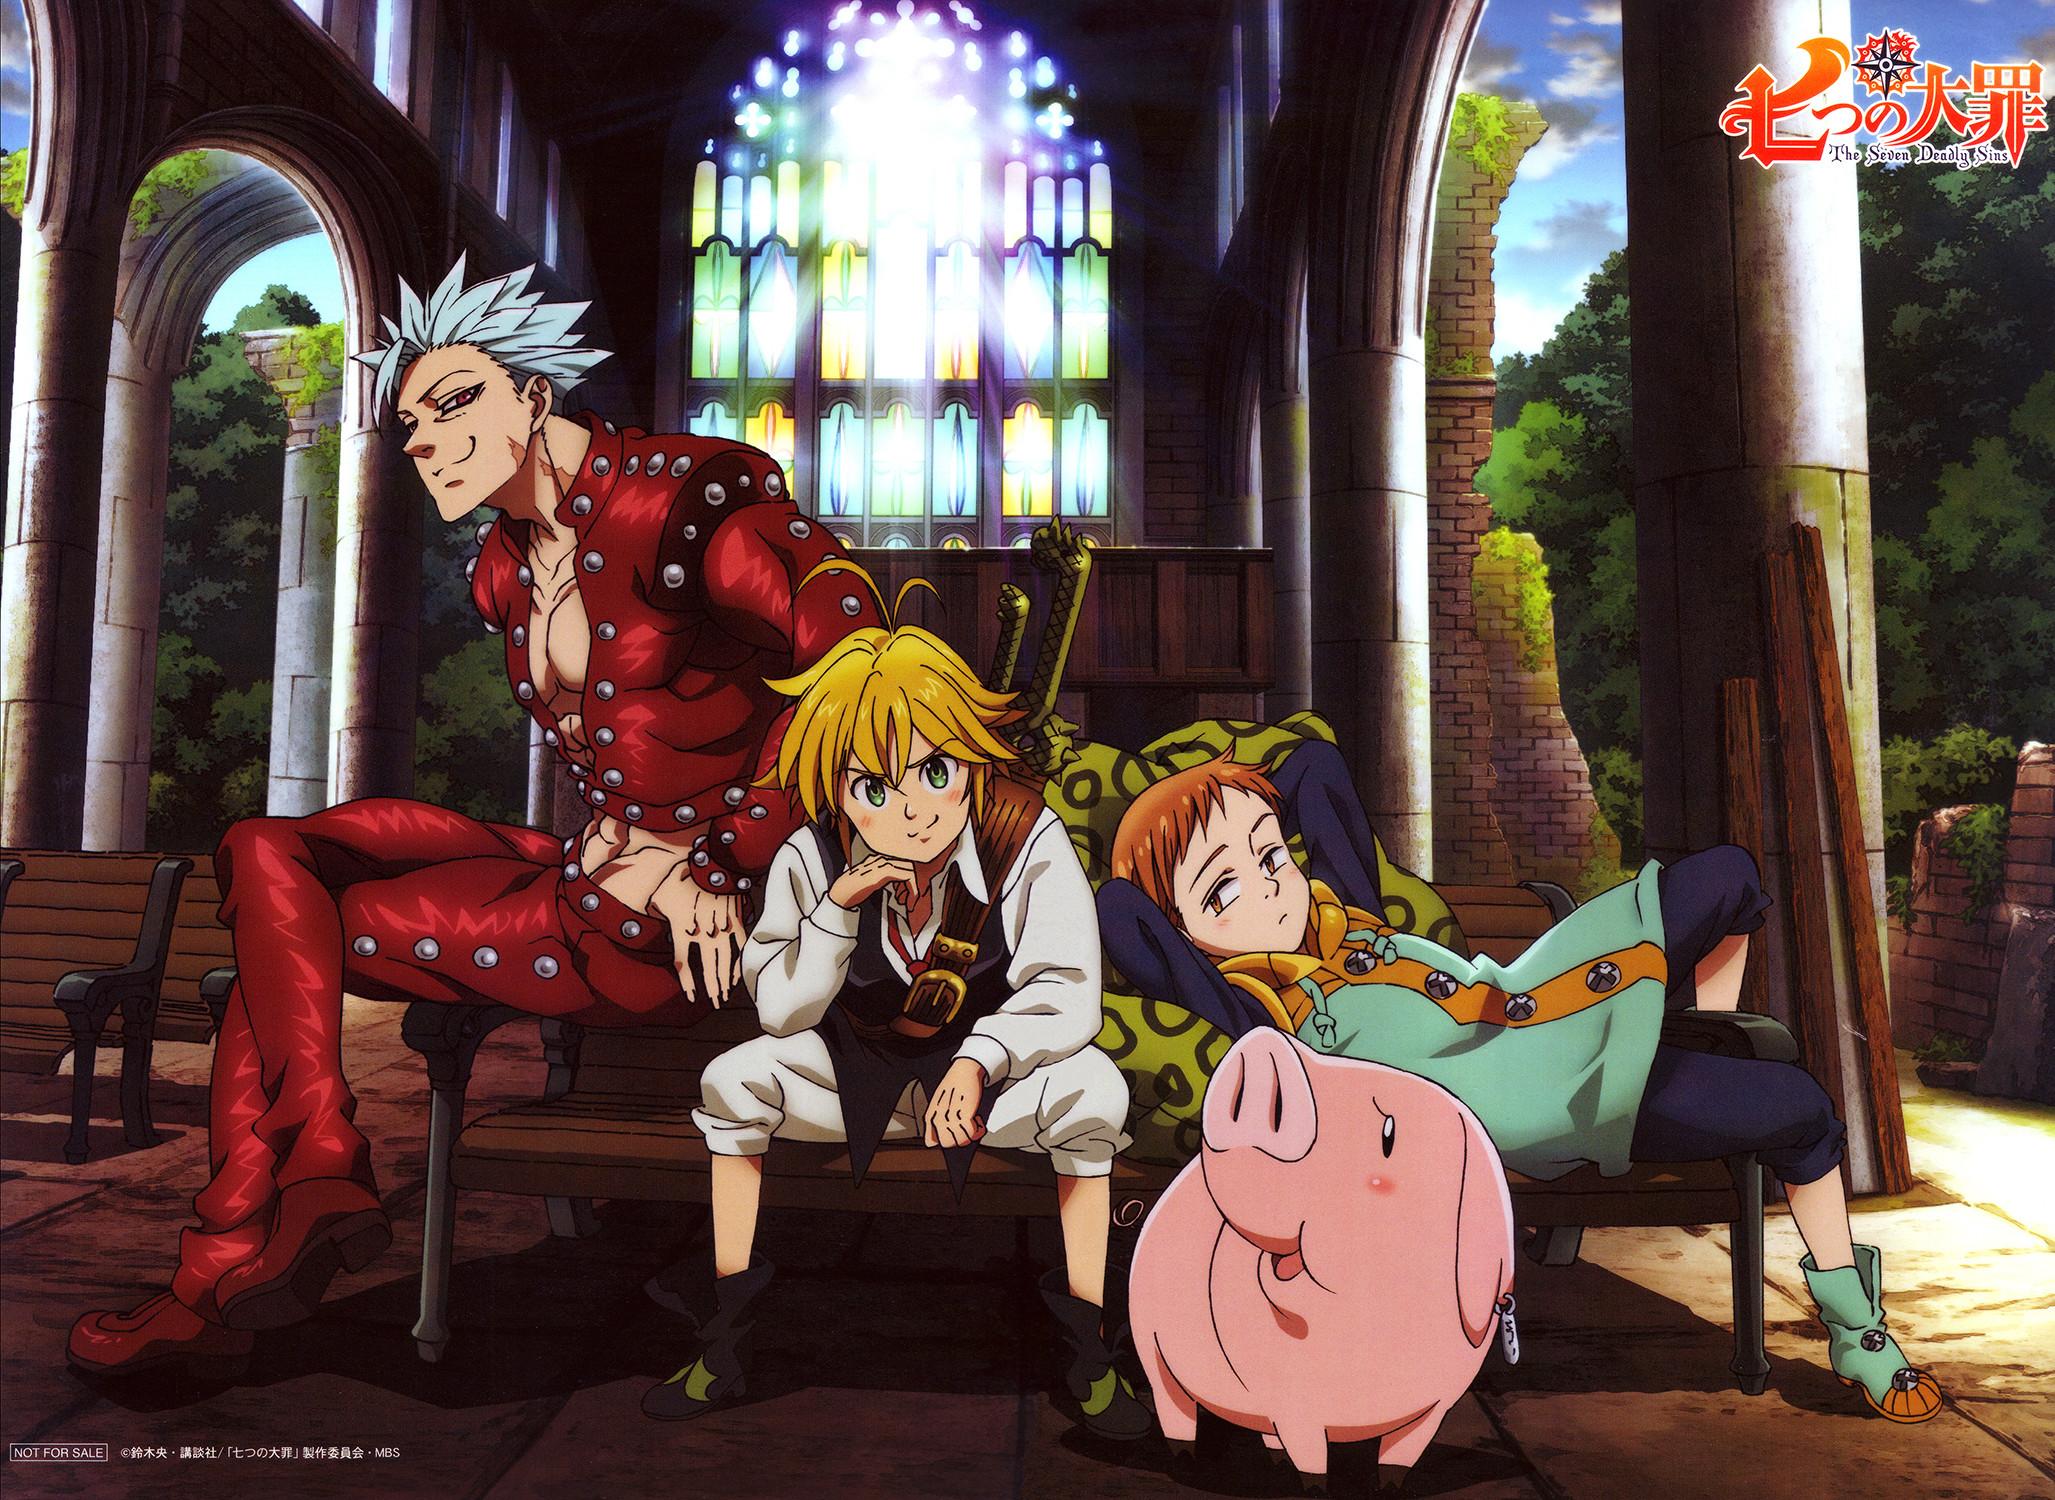 … Nanatsu no Taizai / Seven Deadly Sins Wallpaper HD by corphish2